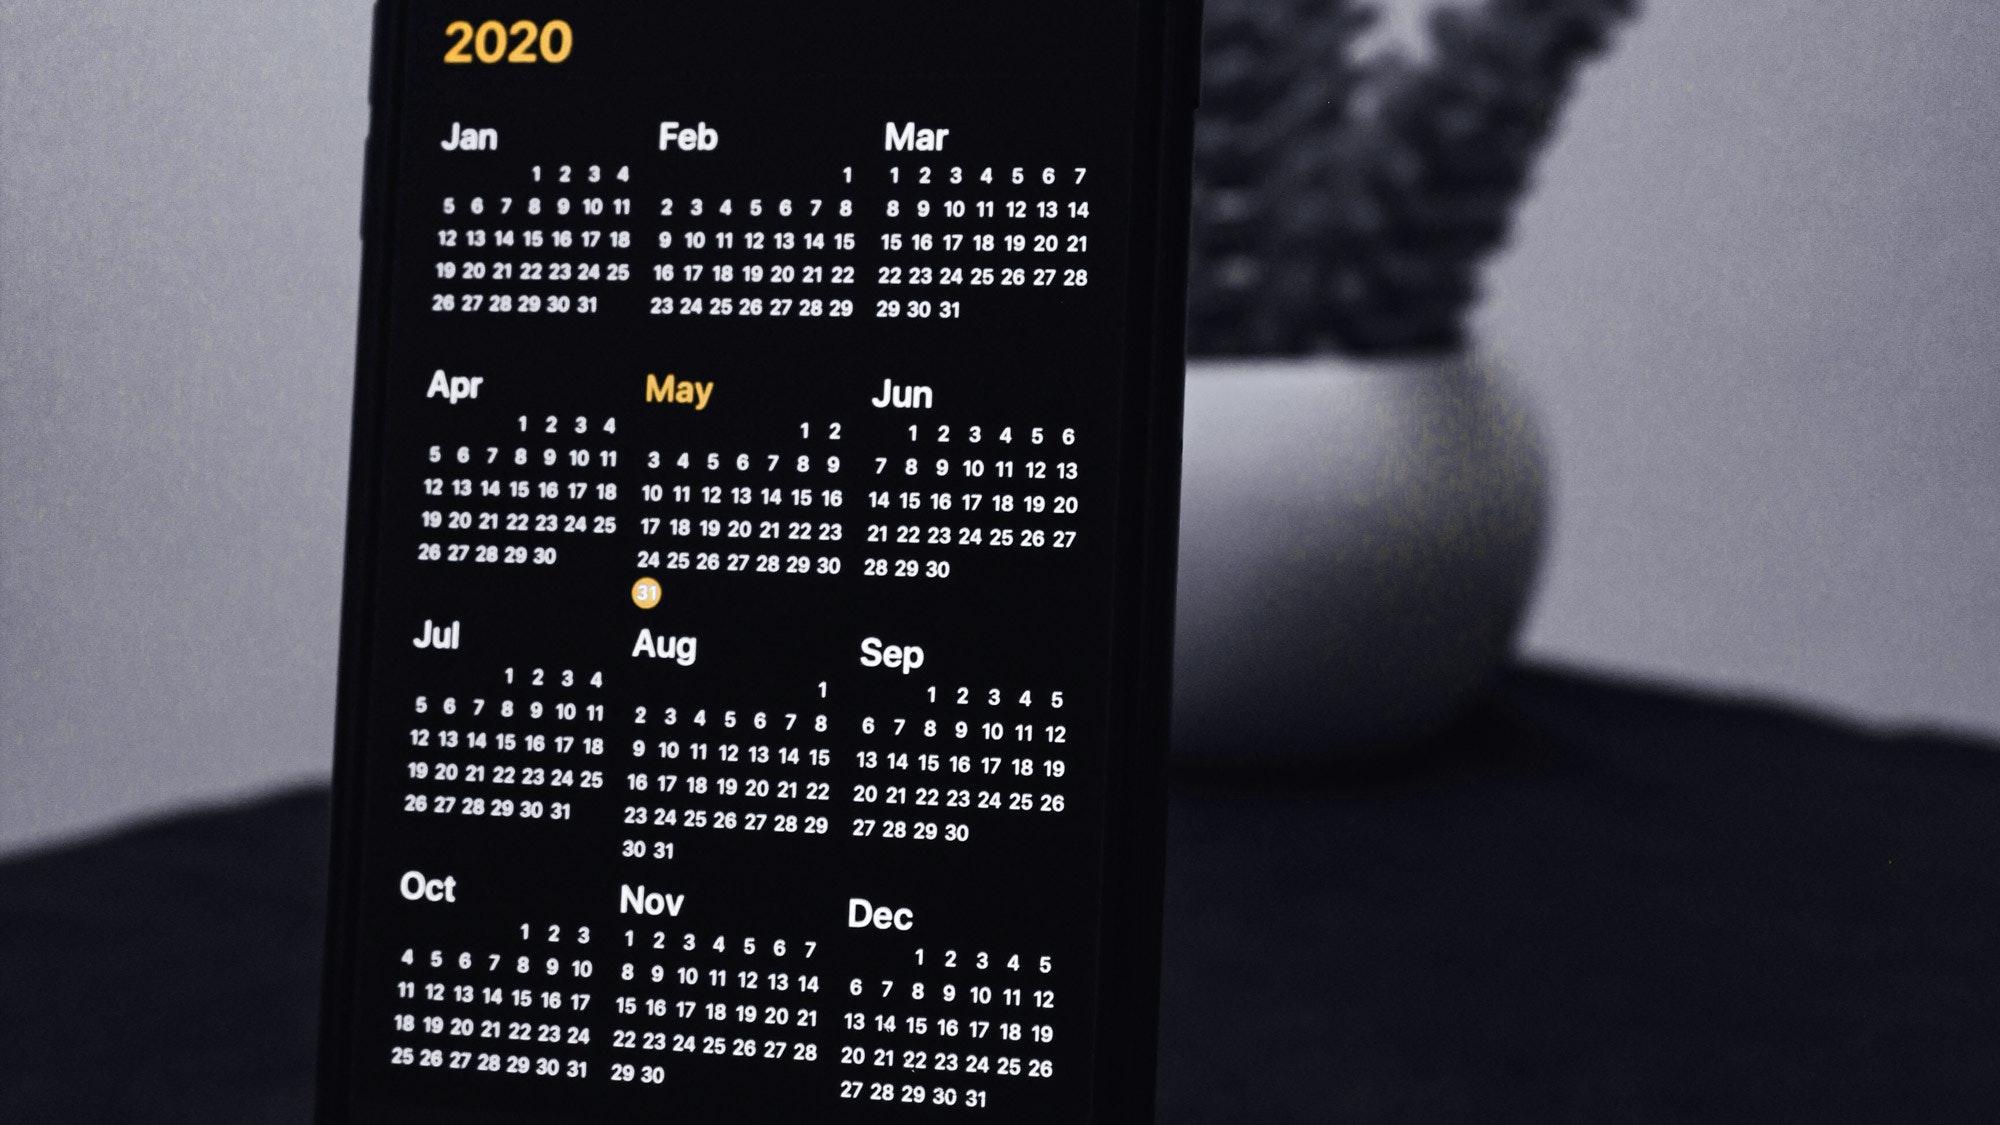 2020 key dates on Amazon calendar